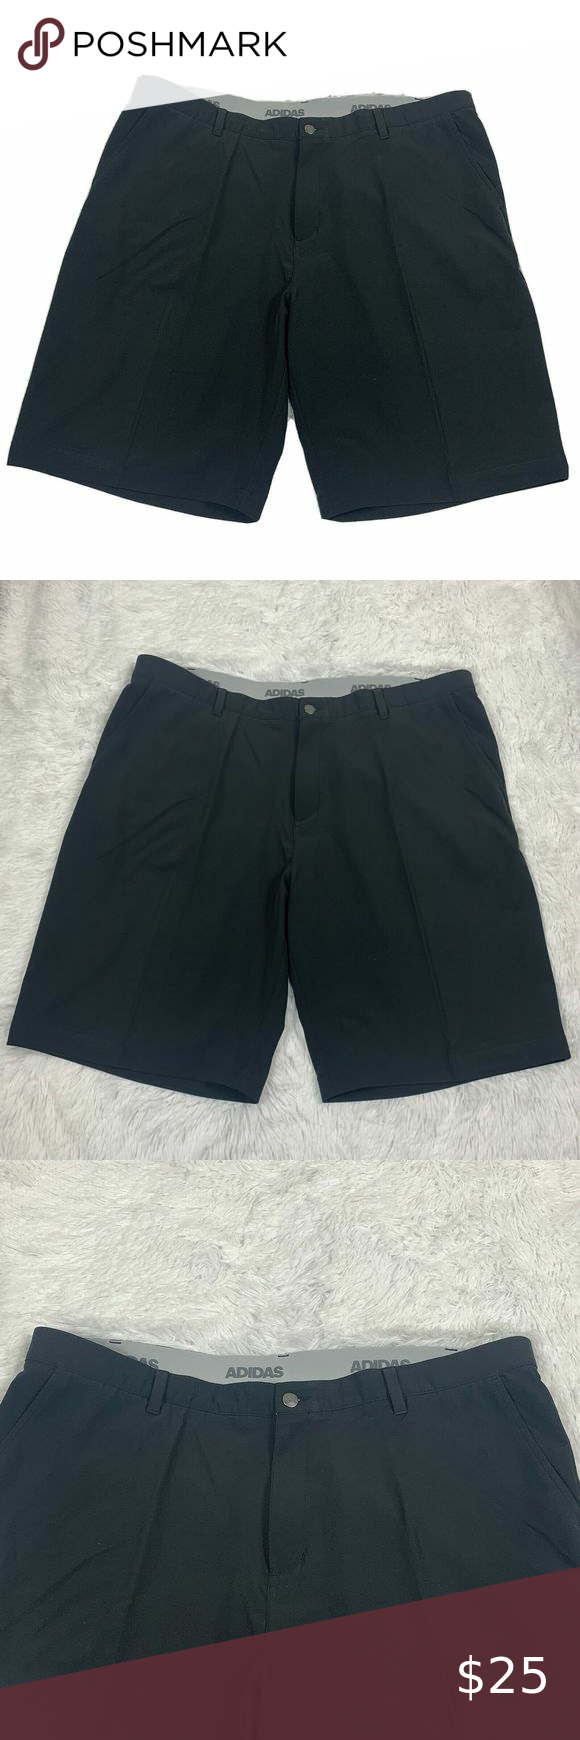 10+ Adidas mens golf shorts on sale ideas